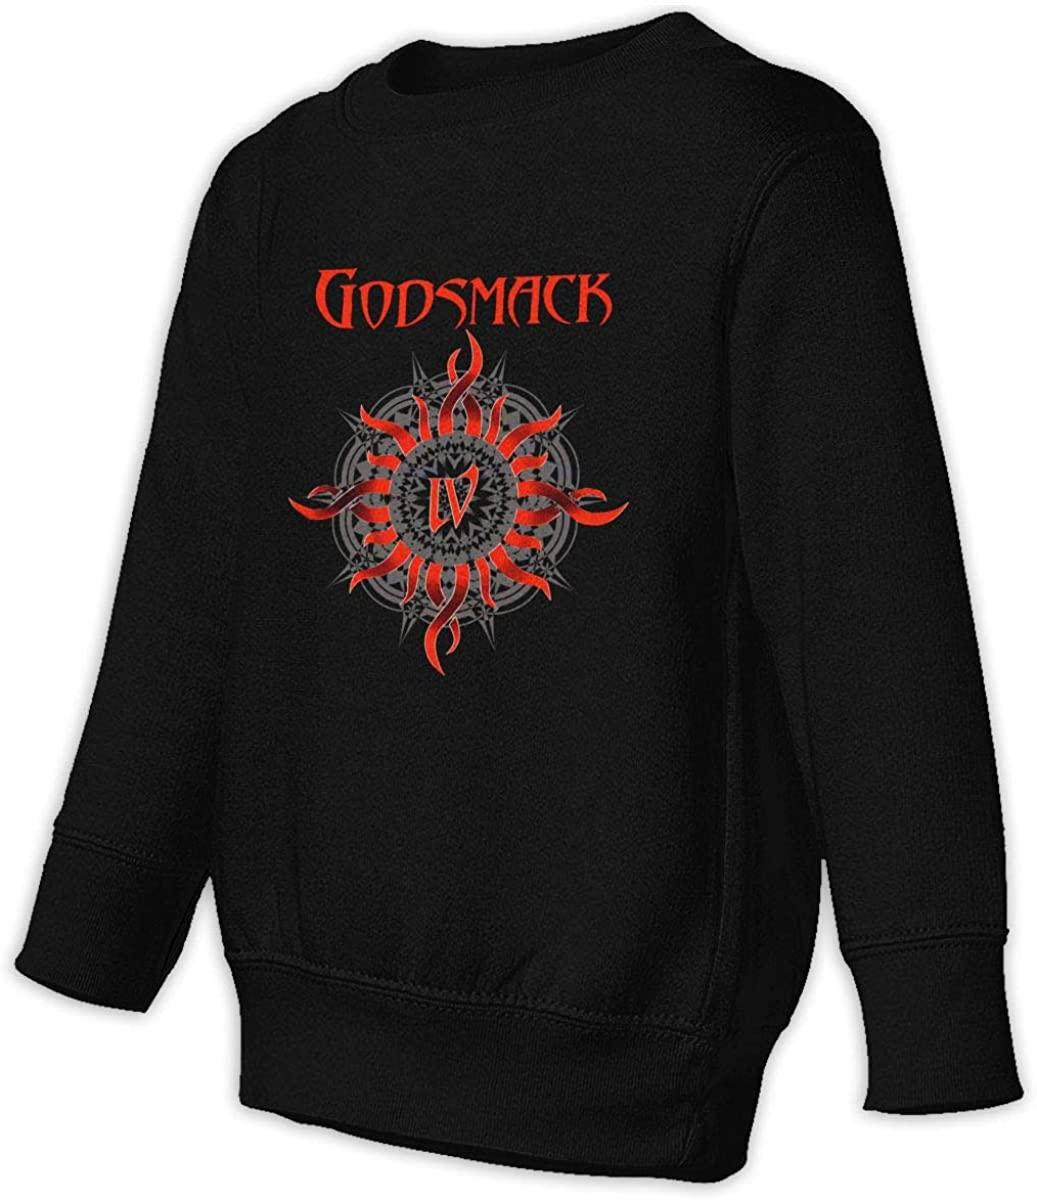 1836 Godsmack Unisex Sweatshirt Youth Boy and Girls Pullover Sweatshirt 3t Black